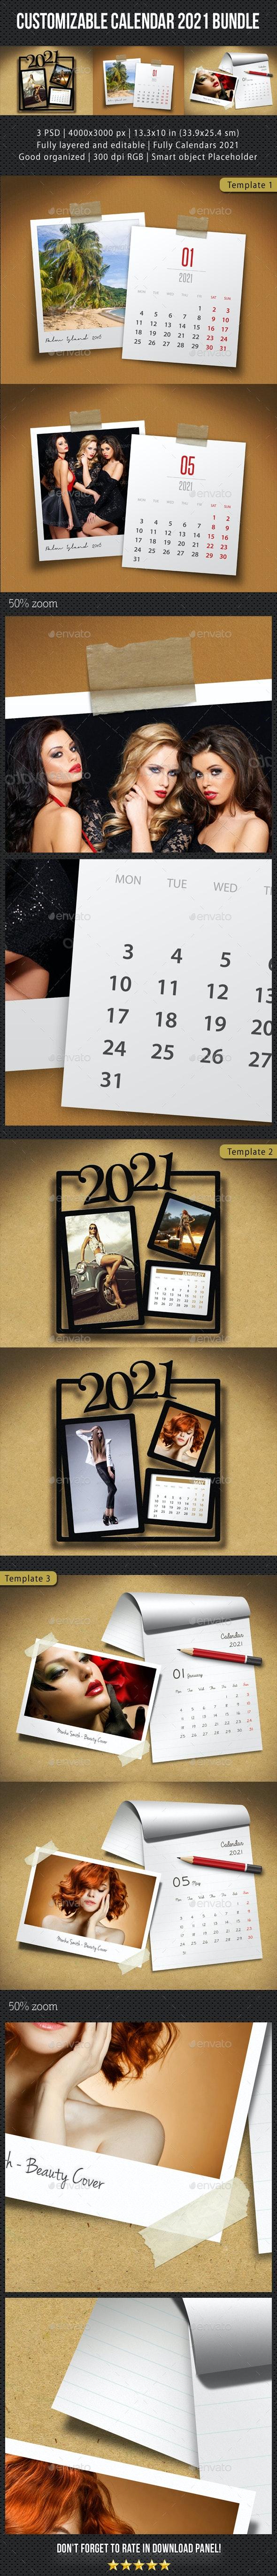 3 in 1 Customizable Calendar 2021 Bundle V02 - Miscellaneous Photo Templates